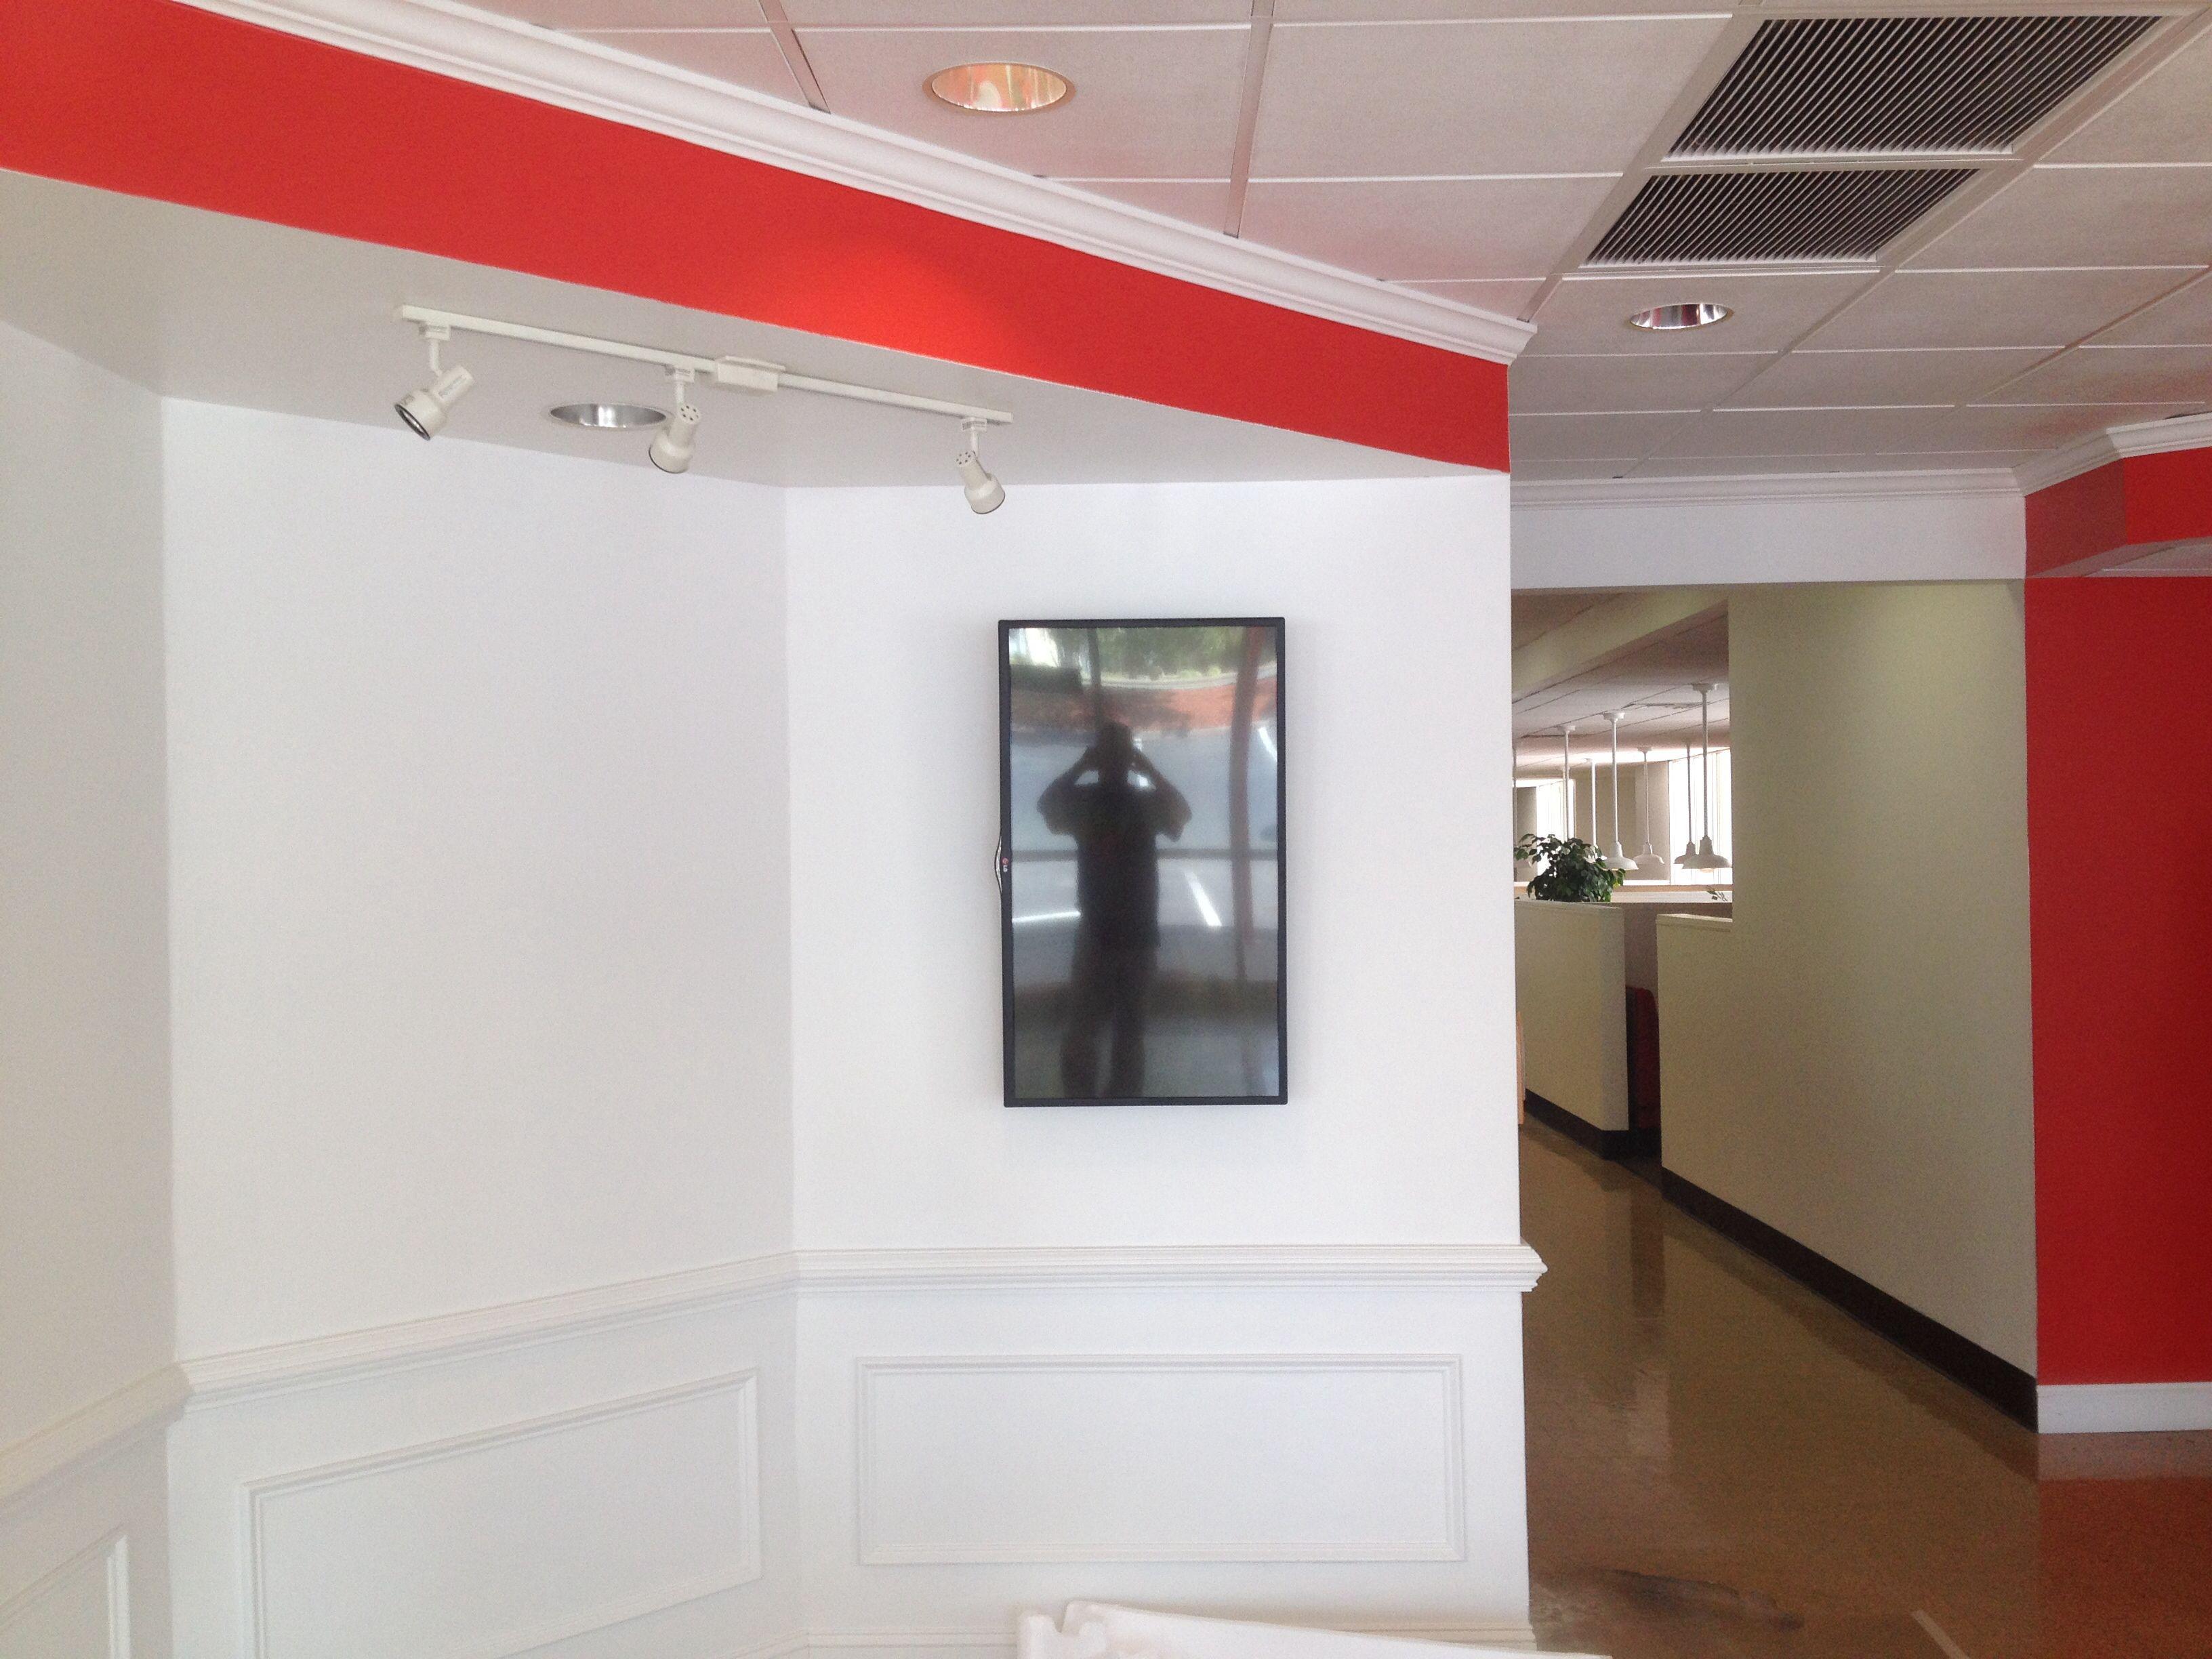 LG TV / monitor mounted sideways for restaurant menu… | Commercial